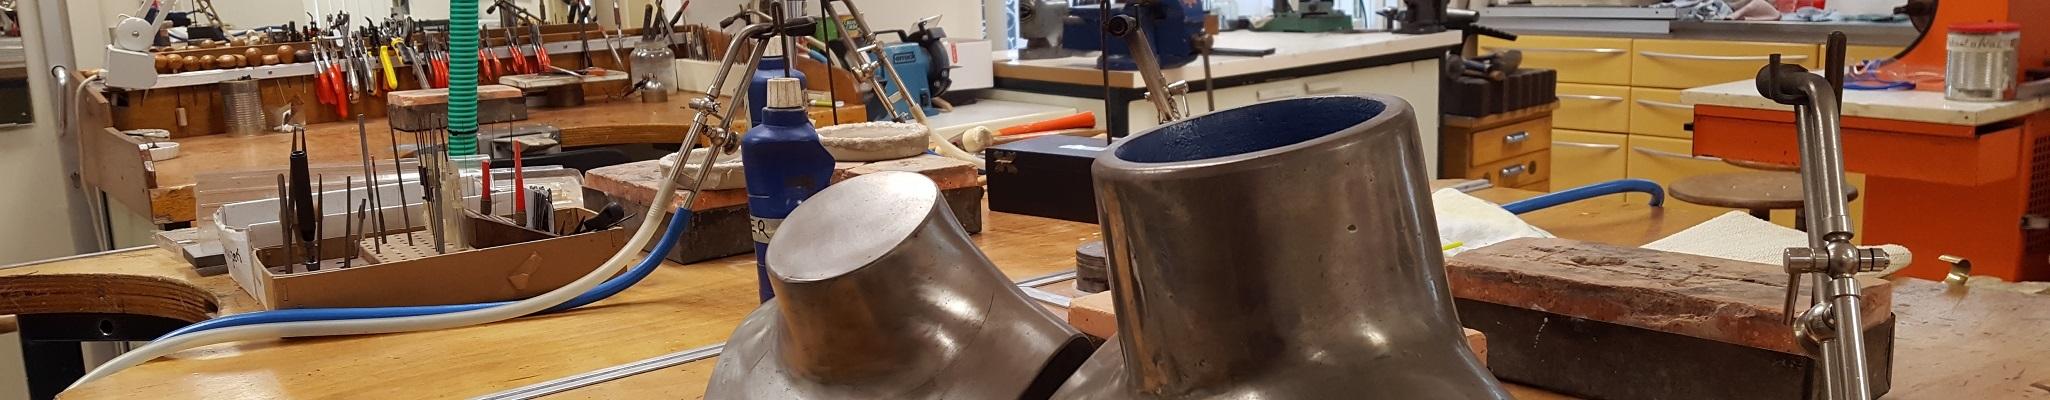 Goud zilver ring maken sieraden workshop bedrijfsuitje emmen goudsmid elisa cursus goudsmeden